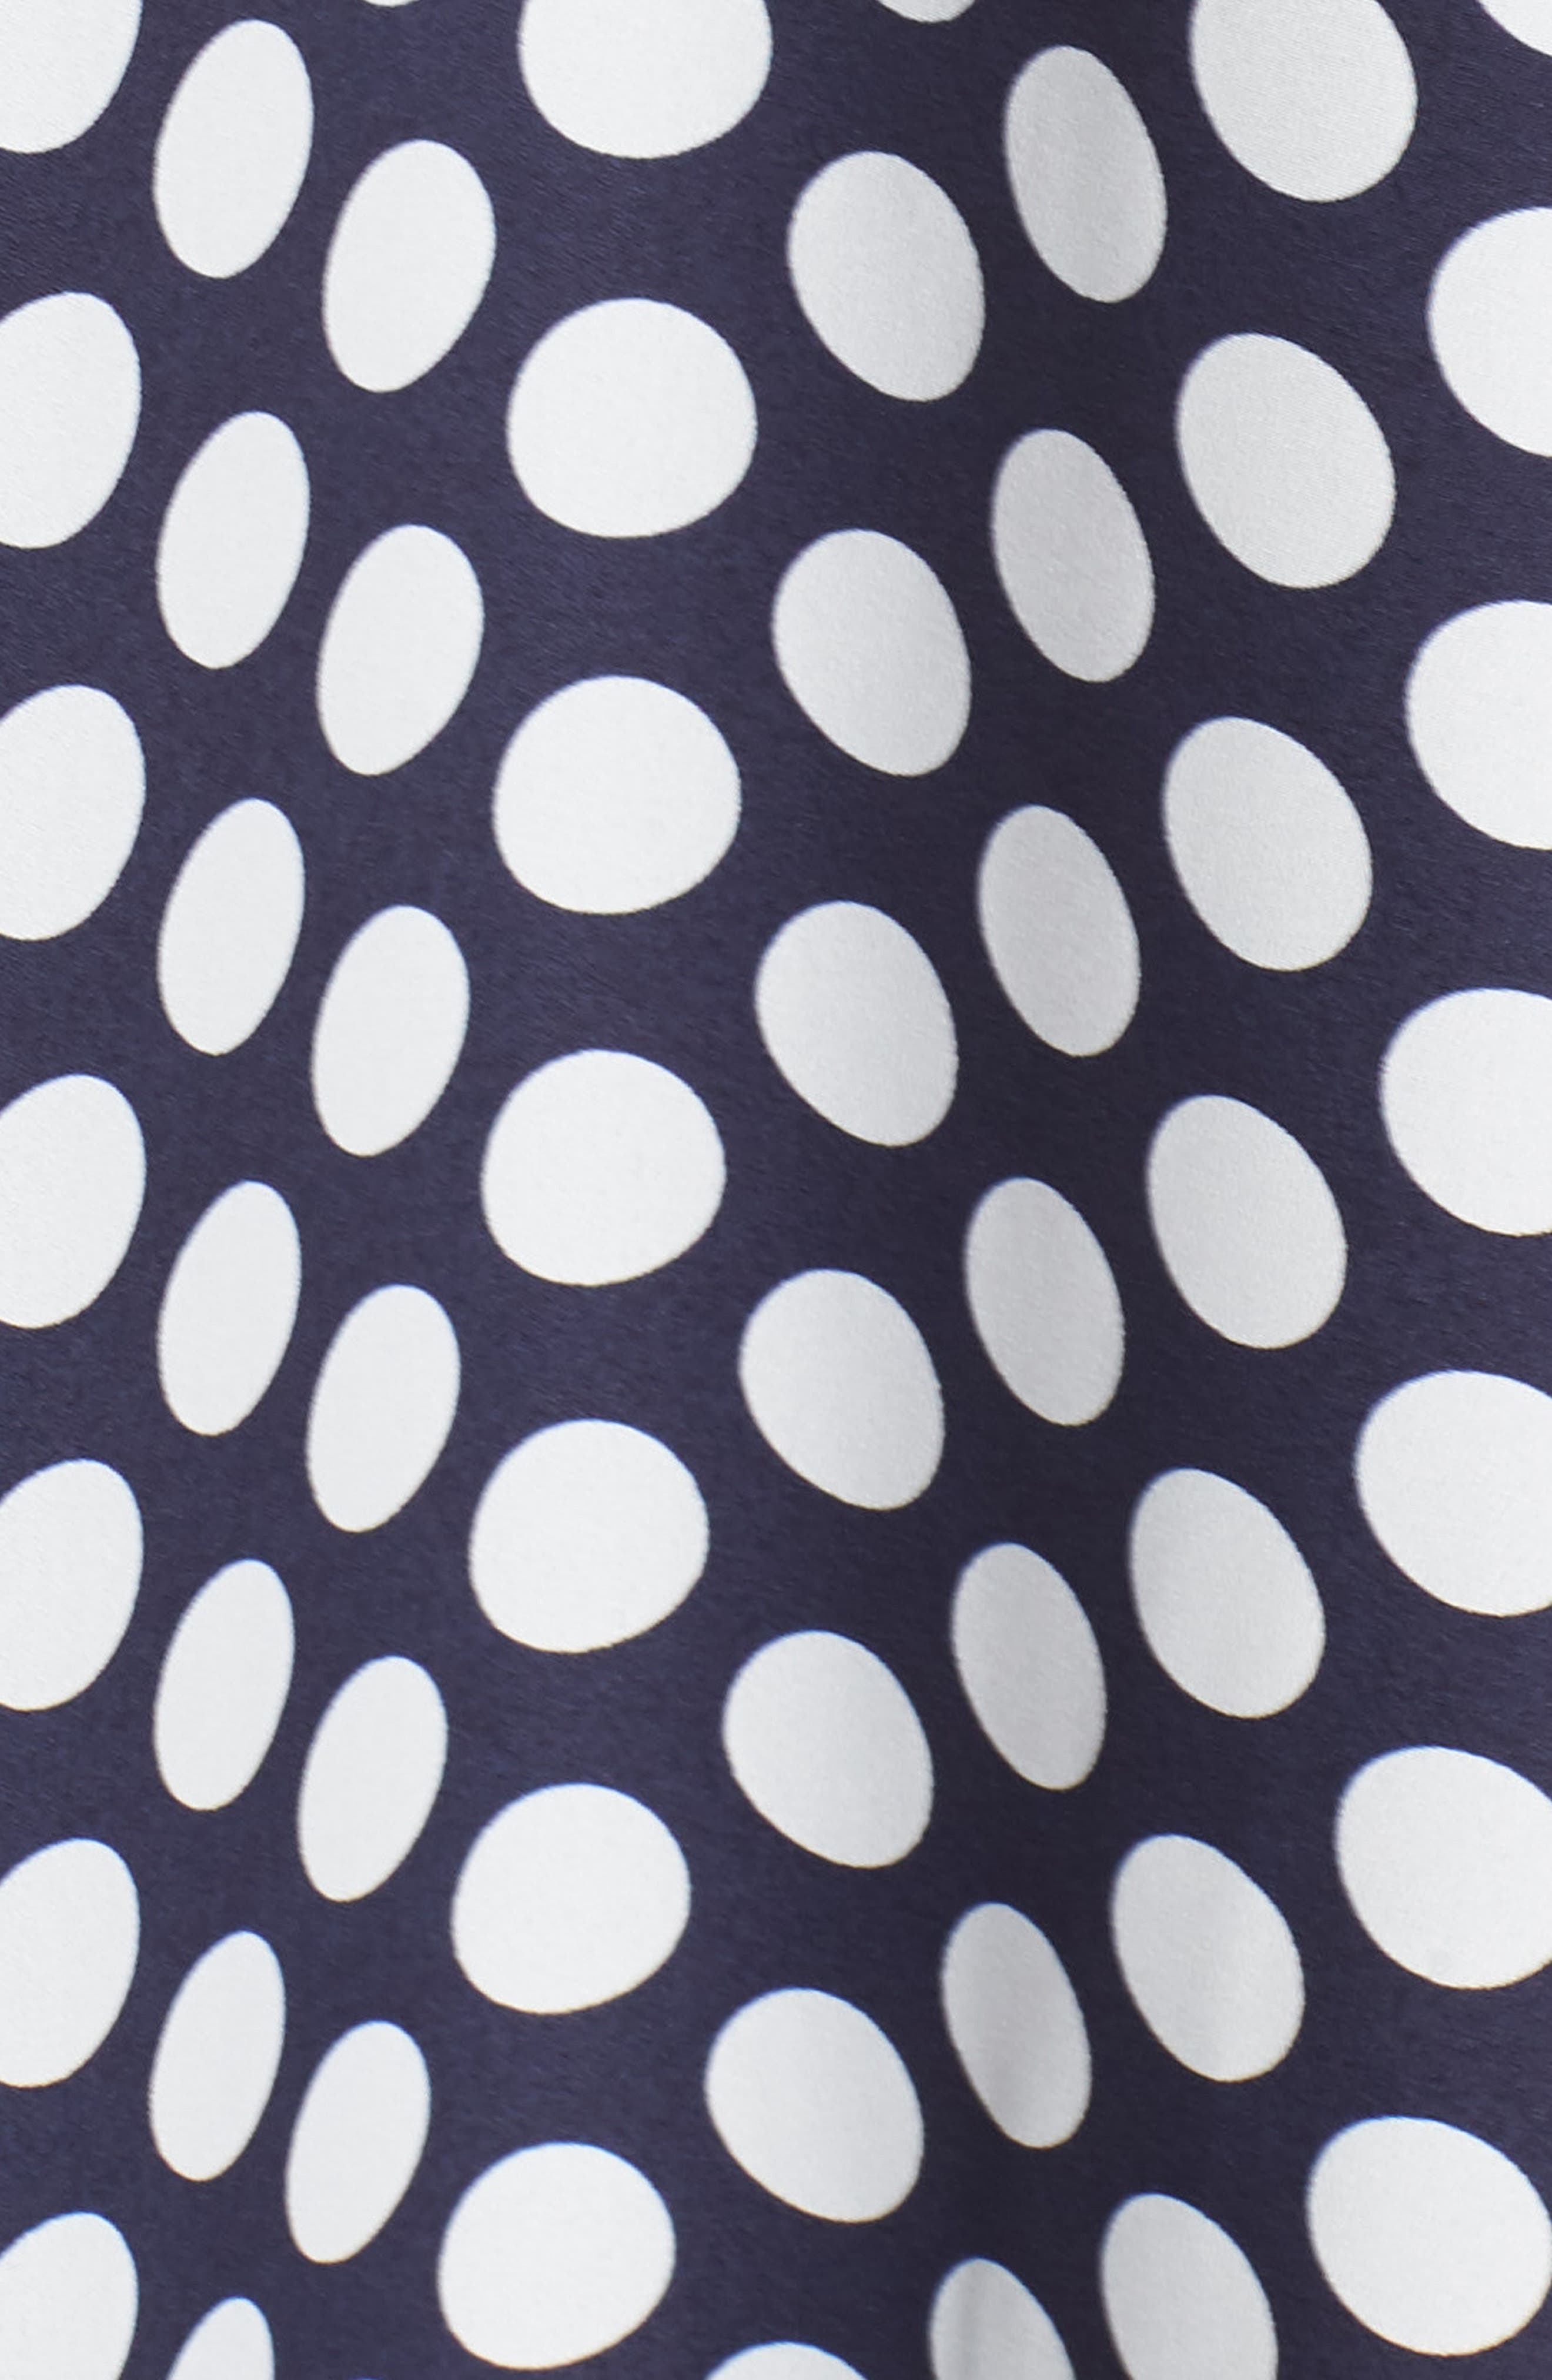 Strapless Dot Tie Front Maxi Dress,                             Alternate thumbnail 6, color,                             400